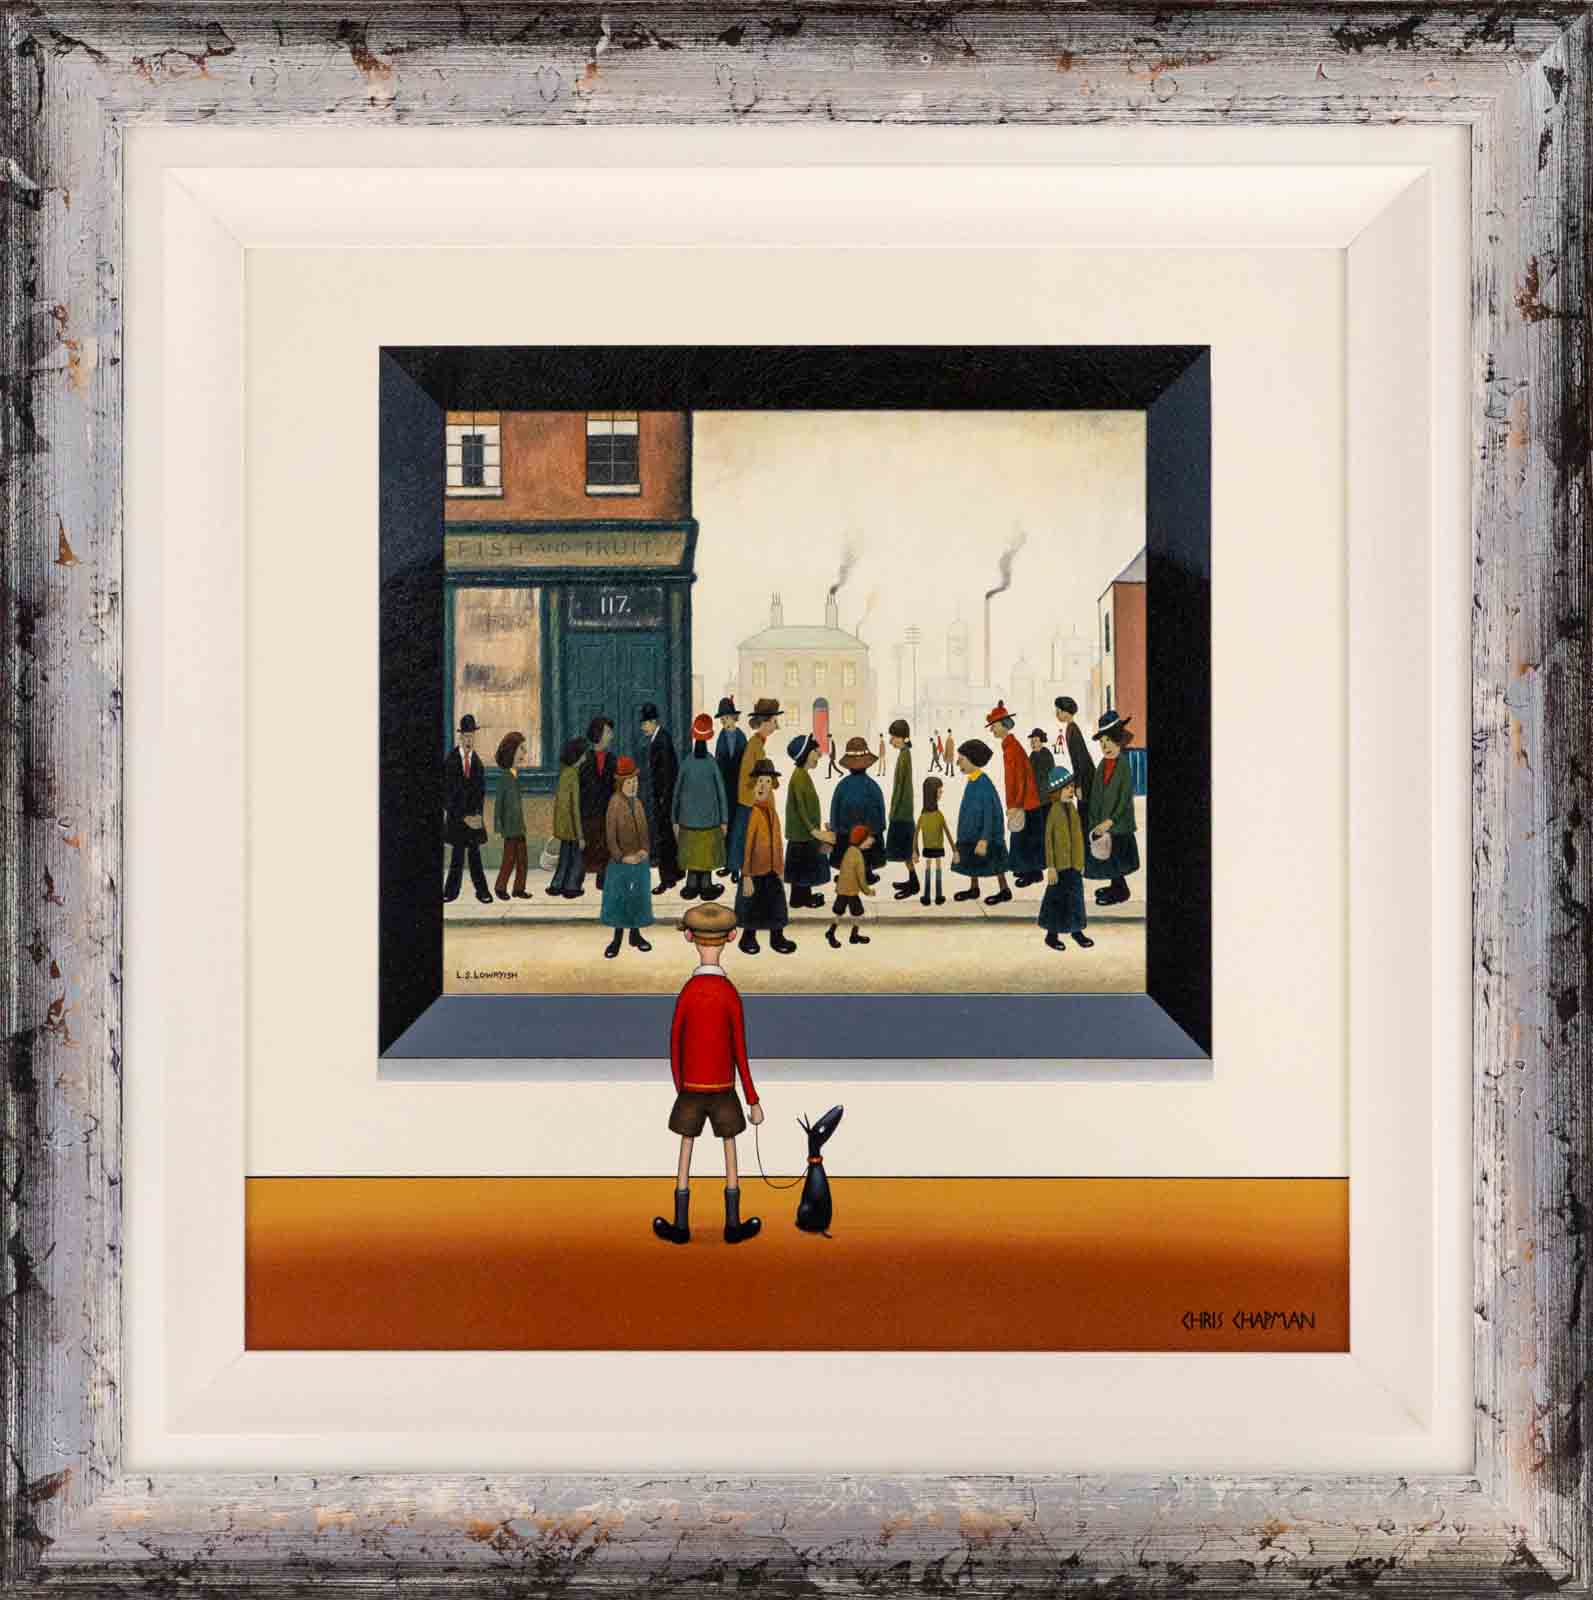 The Shoppers, Chris Chapman